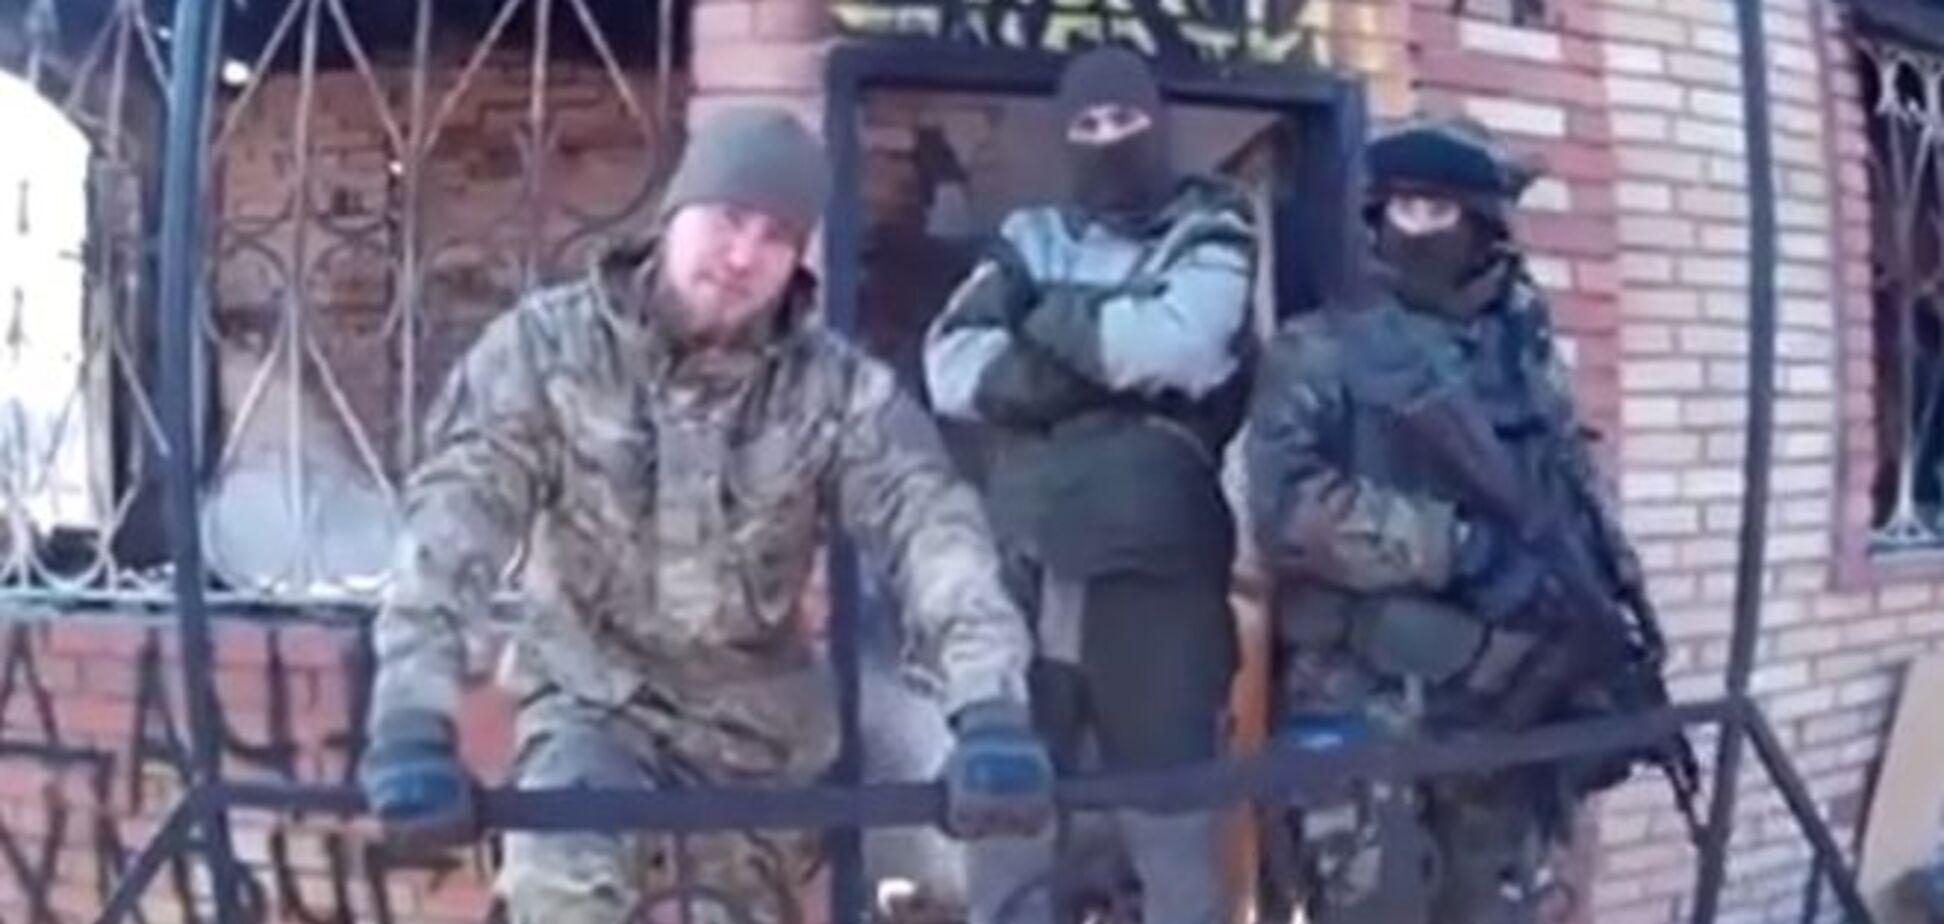 Бойцы 'Правого сектора' сожгли дачу Захарченко под Донецком: опубликовано видео